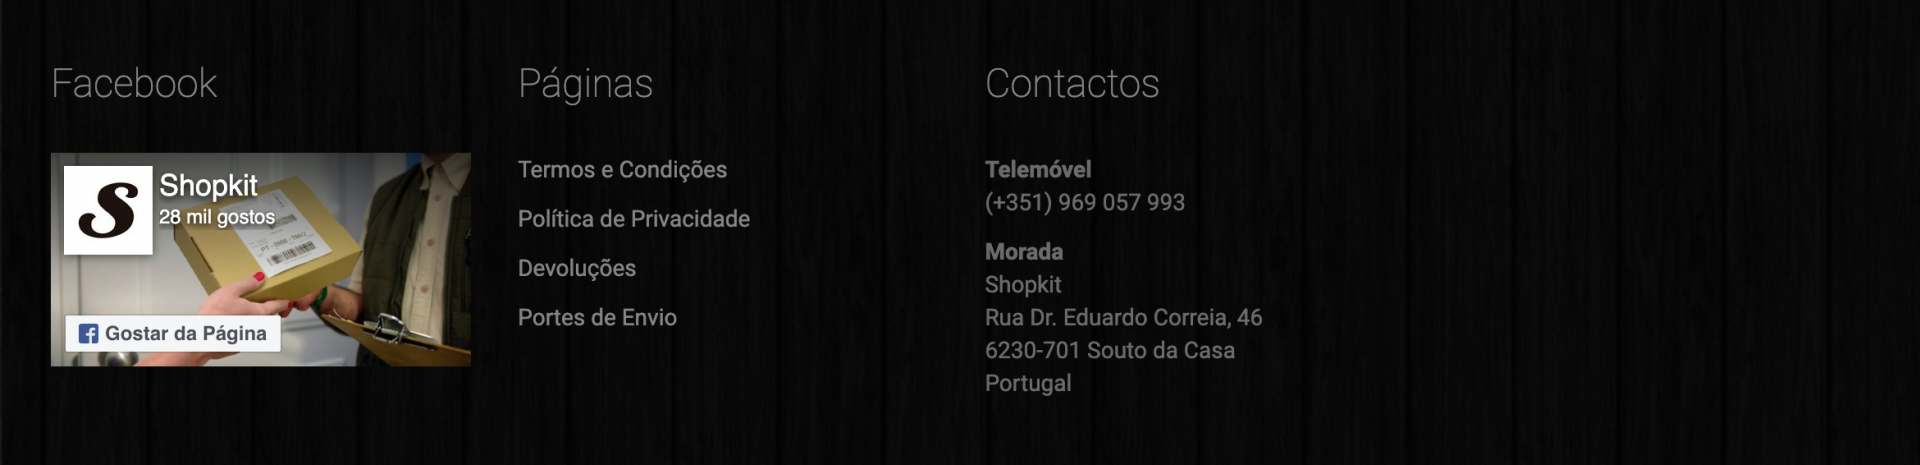 Contactos da loja online